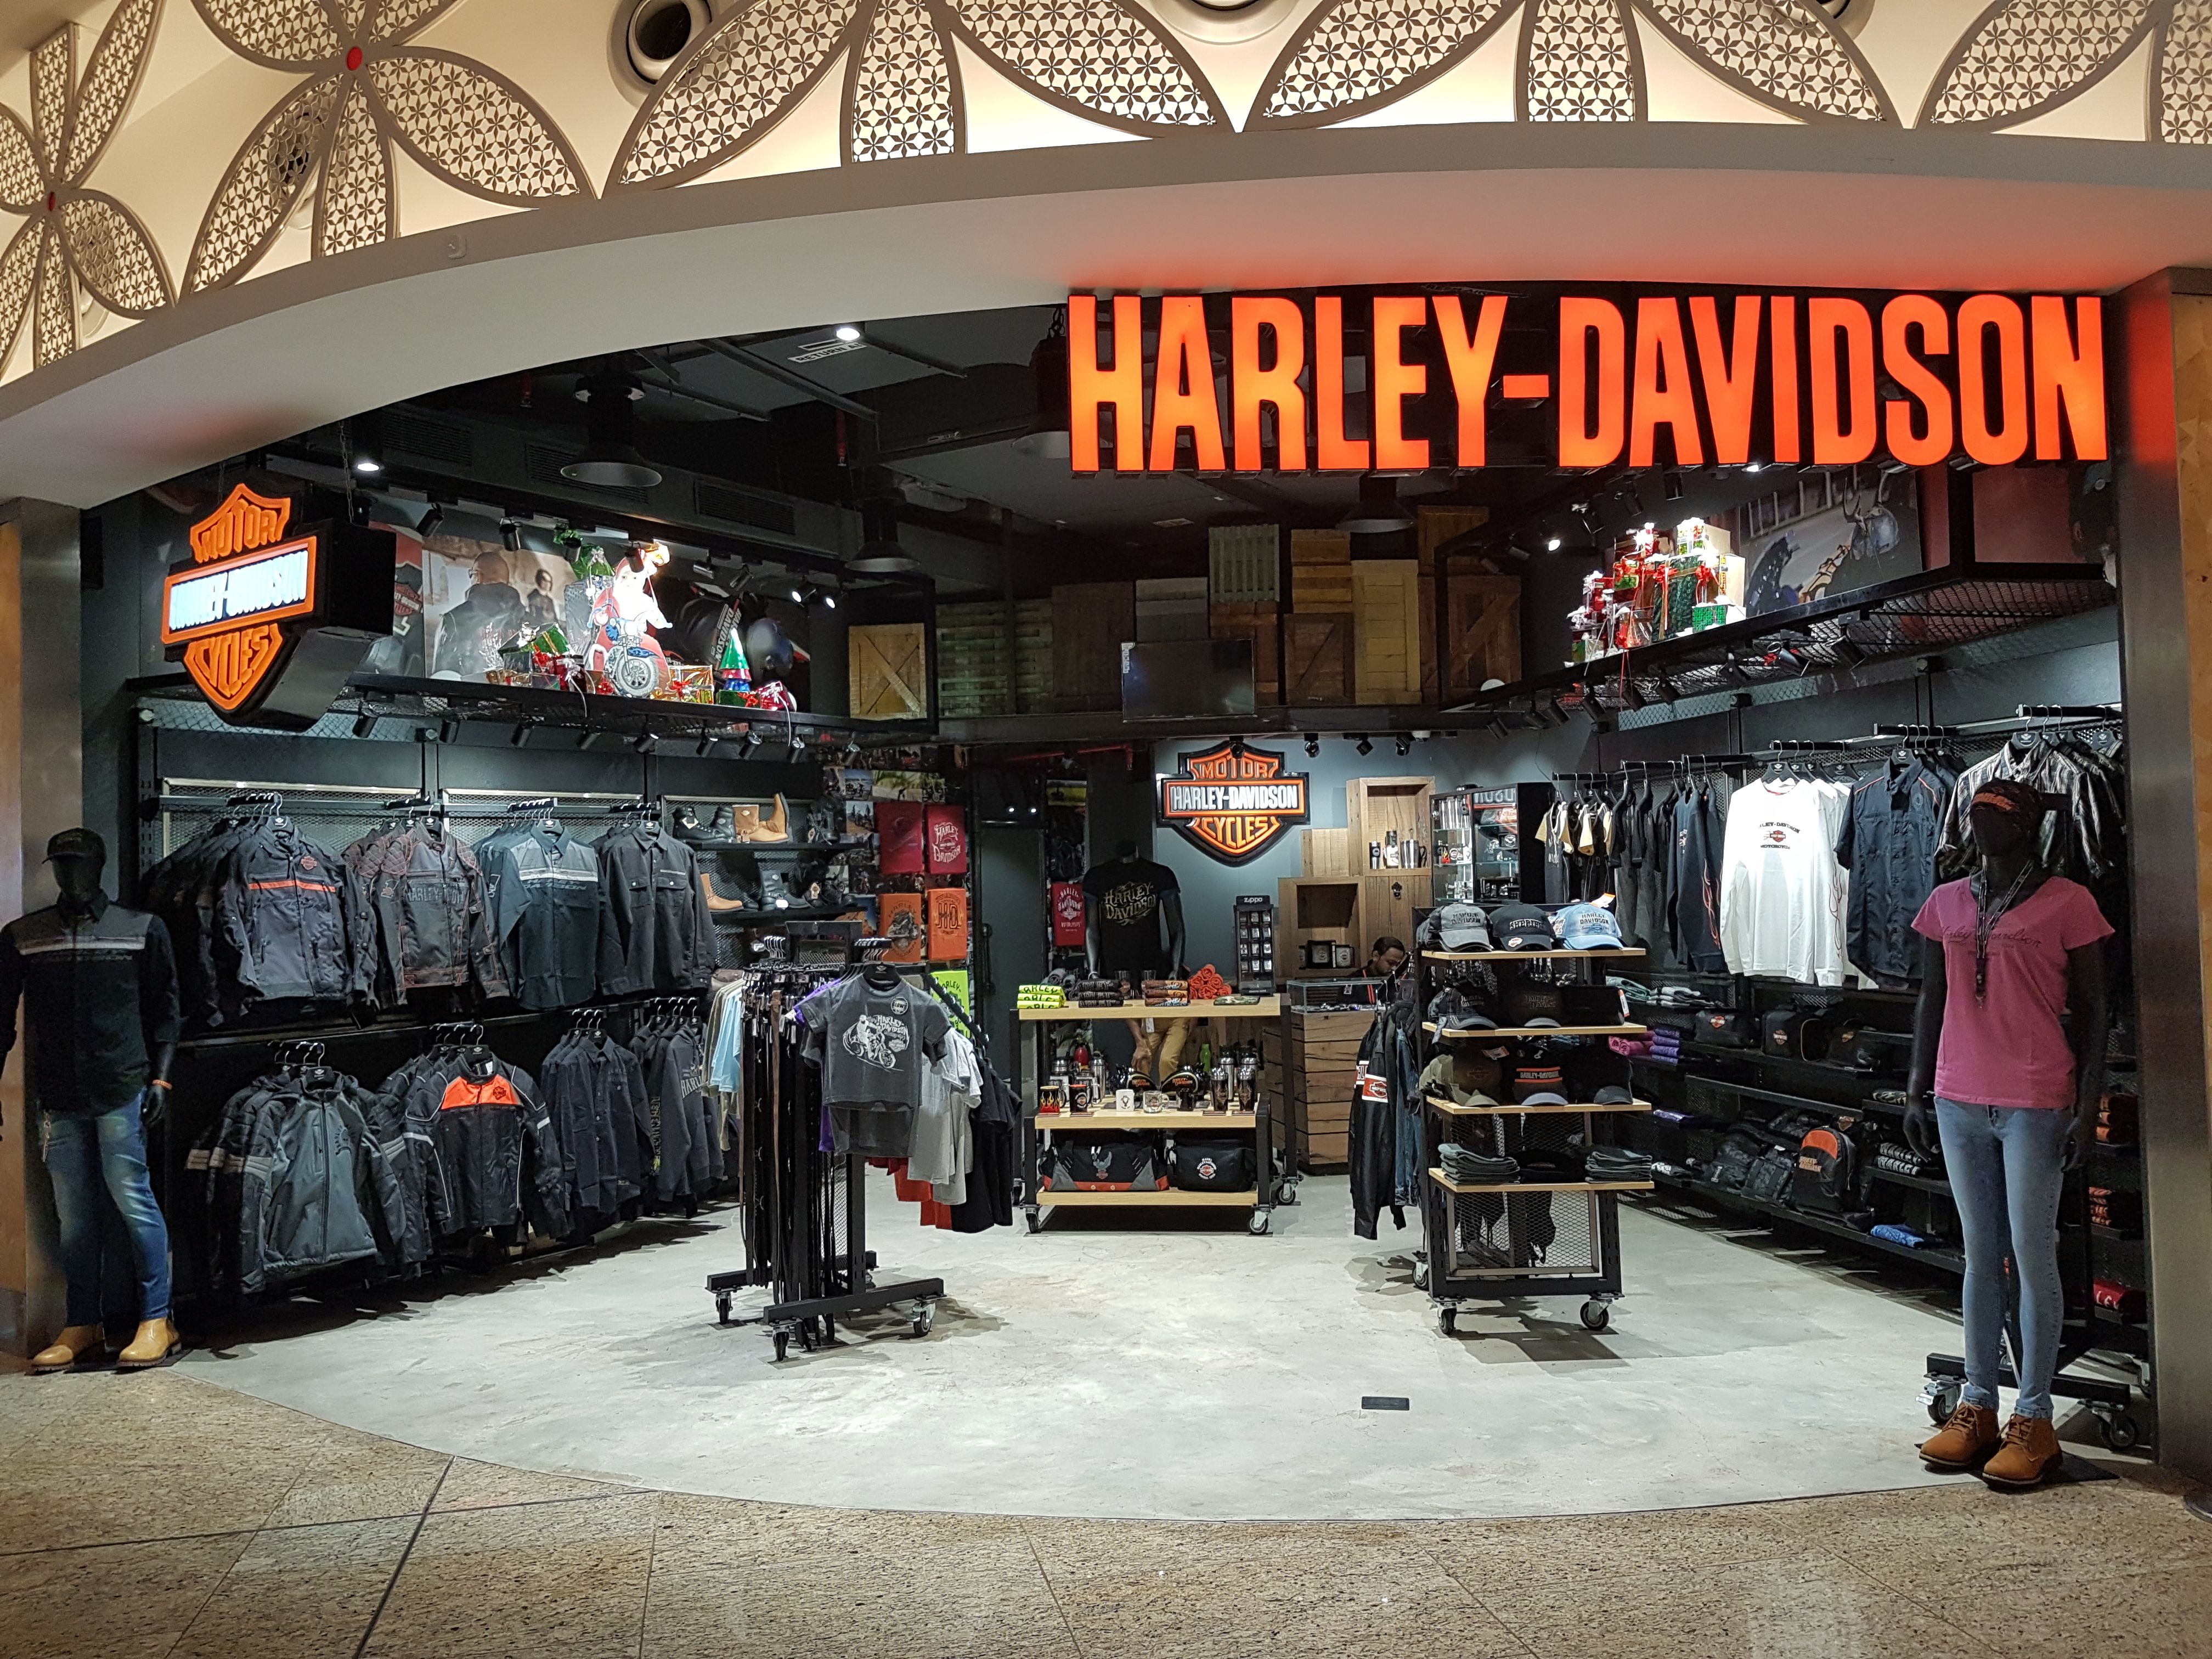 Condensed Concept Of Harley Davidson At T2 Terminal Mumbai Airport Mumbai Airport Shopping Destinations Harley Davidson